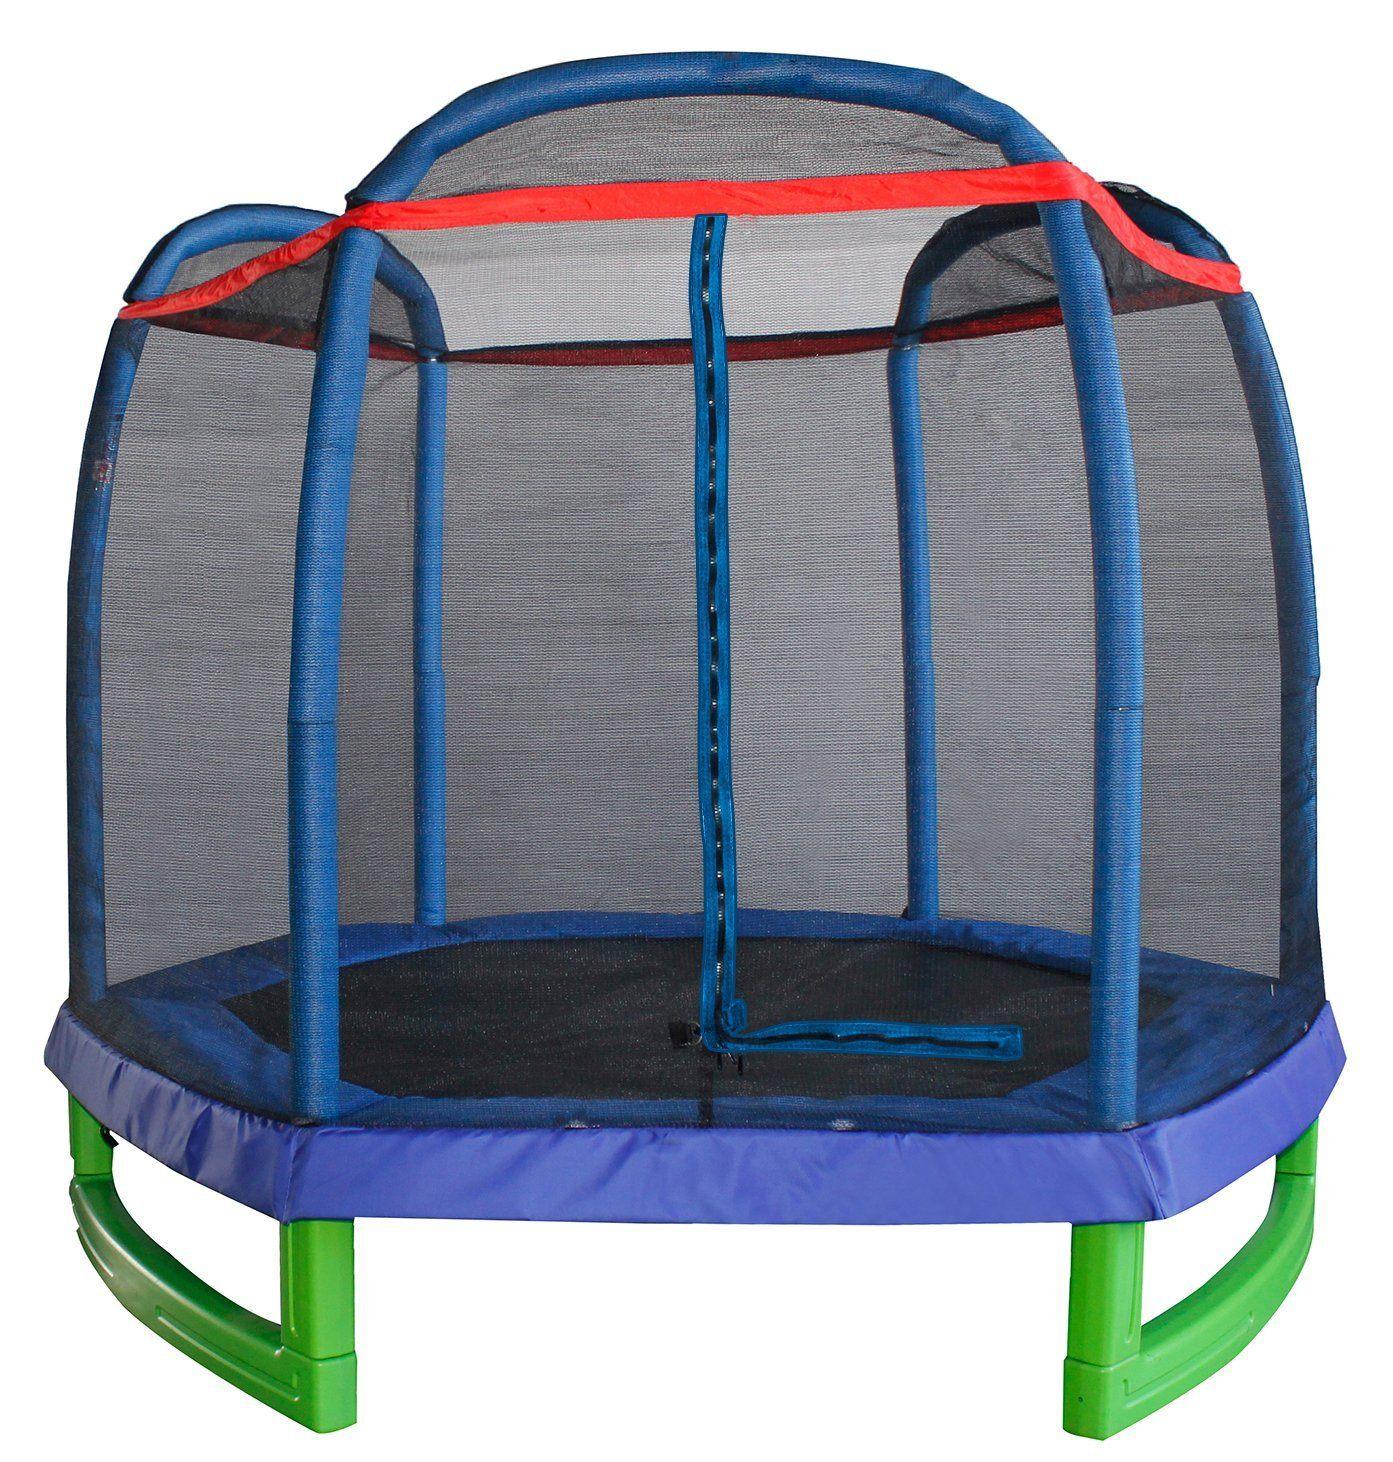 merax-7-foot-kids-trampoline-and-enclosure-set